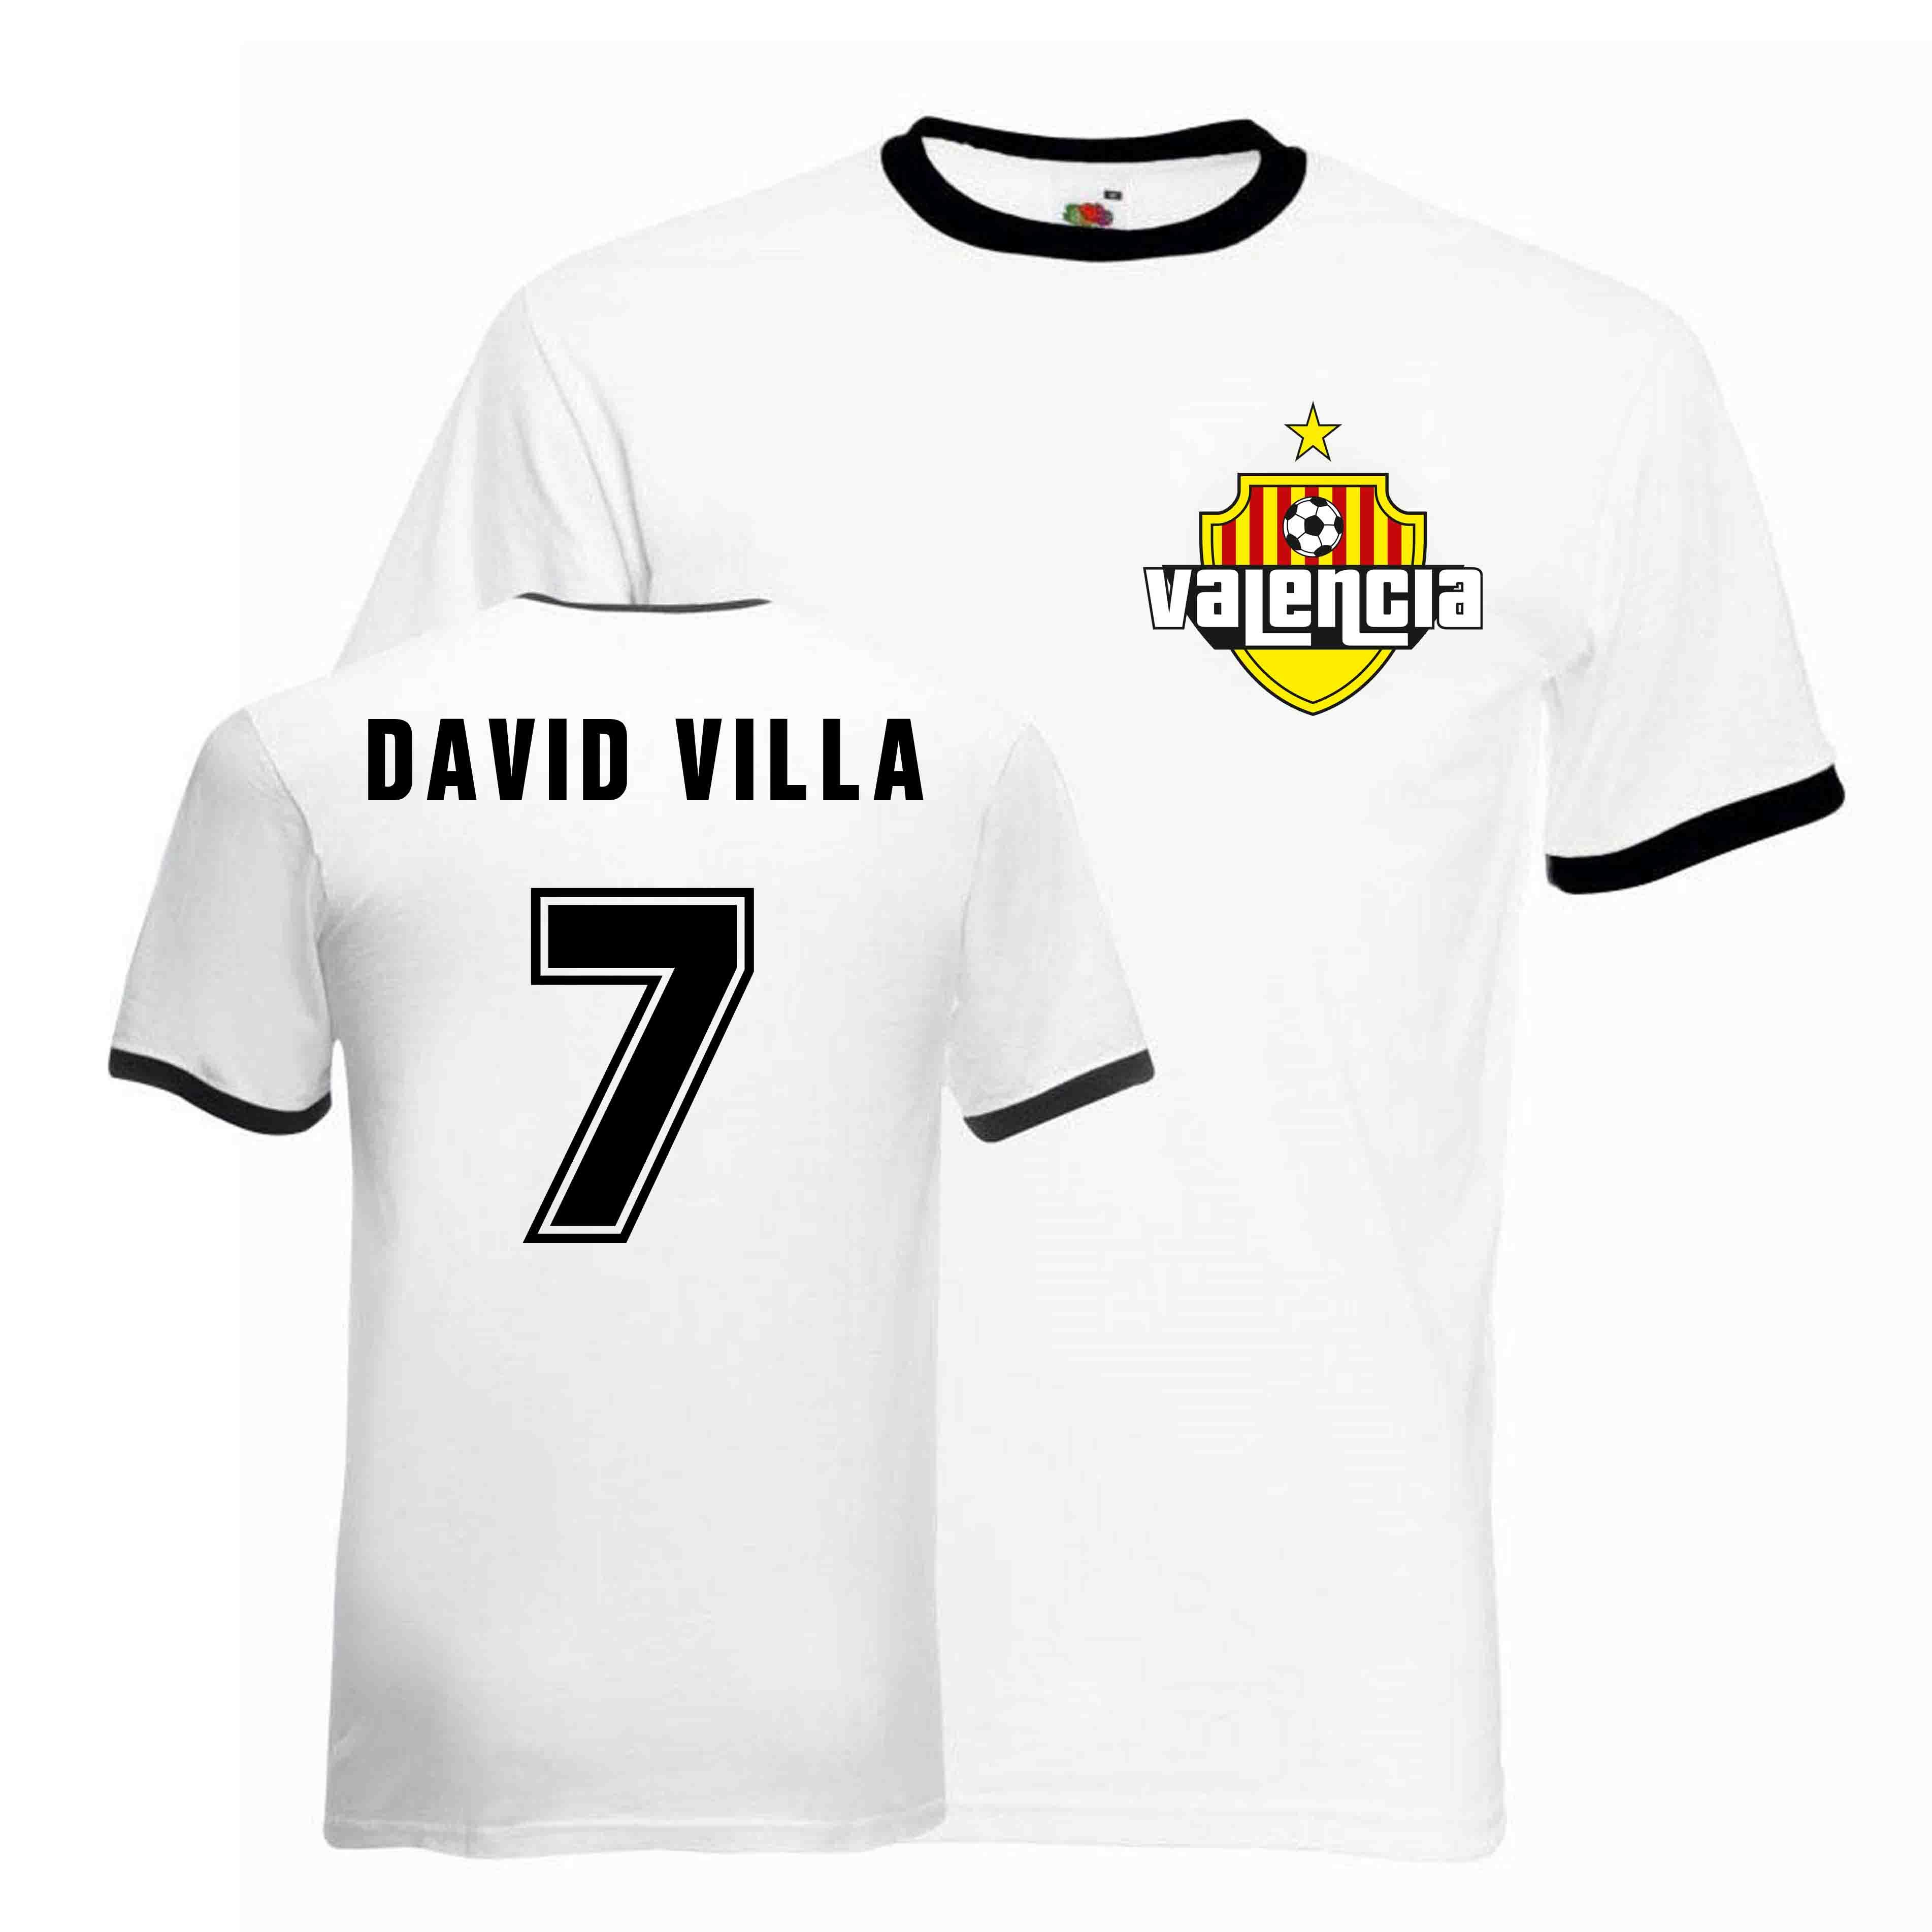 41d6cbecffb David Villa Valencia Ringer Tee (white-black)  RINGWHITEBLACK ...